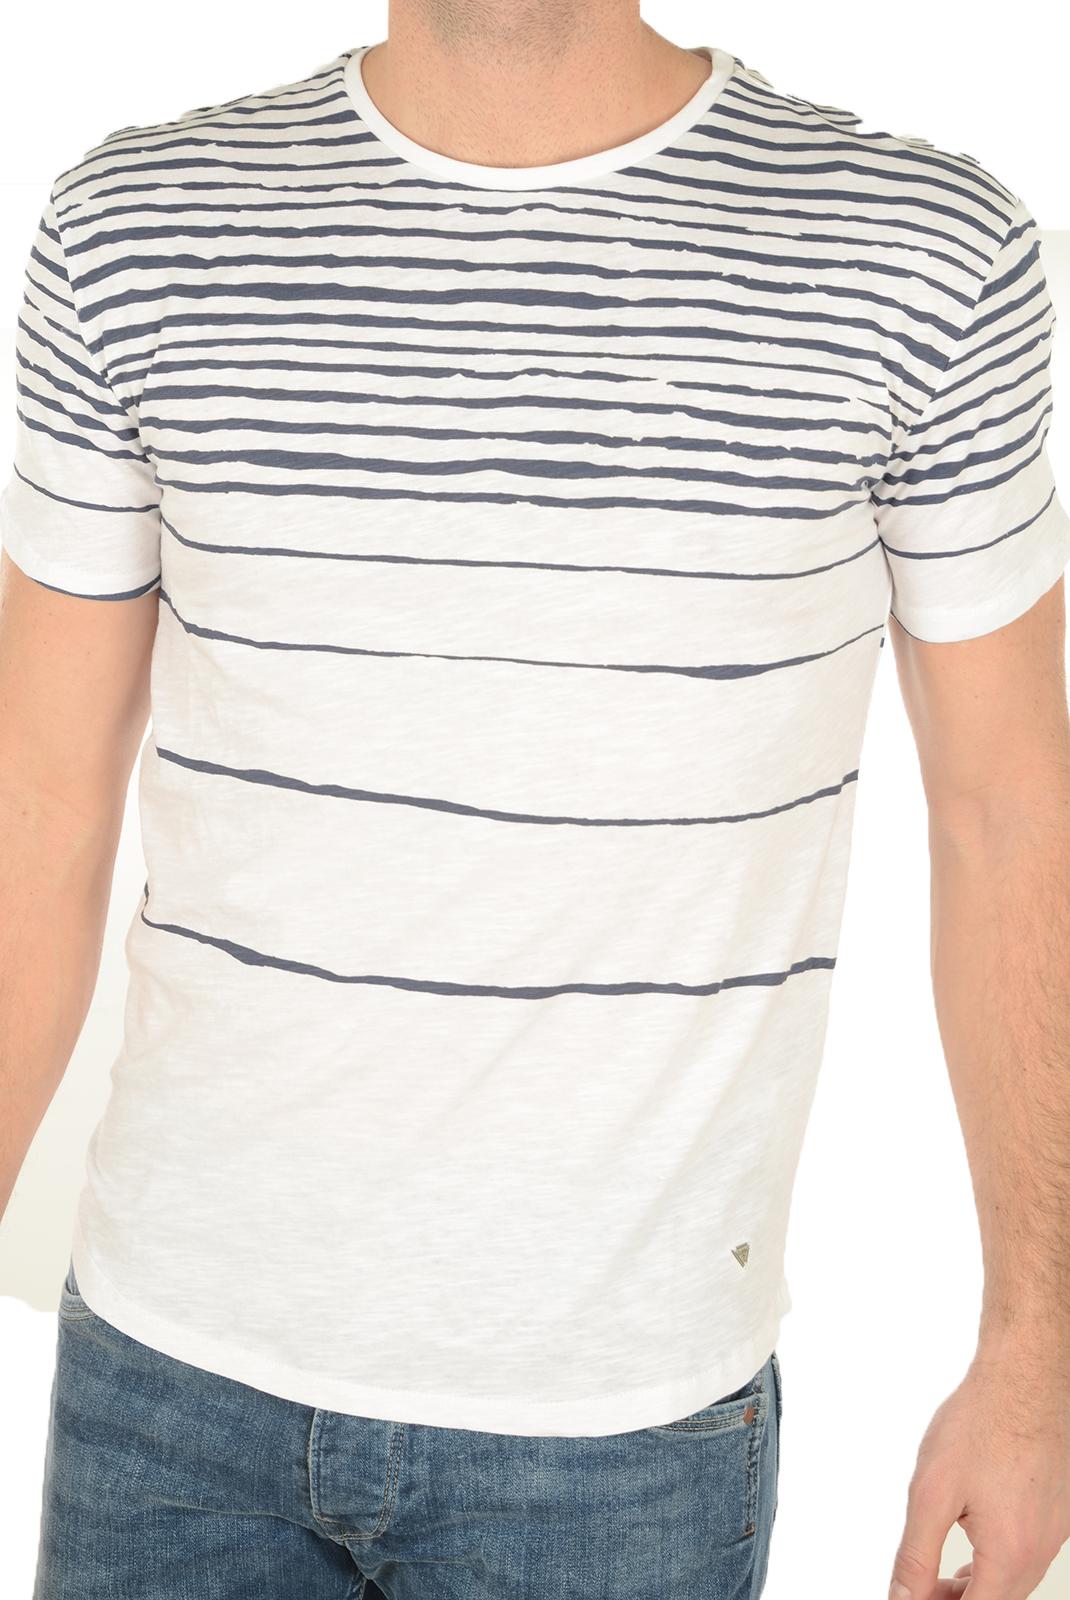 Tee-shirts manches courtes  Guess jeans M72P27 K4YI0 A716 BLANC BLEU